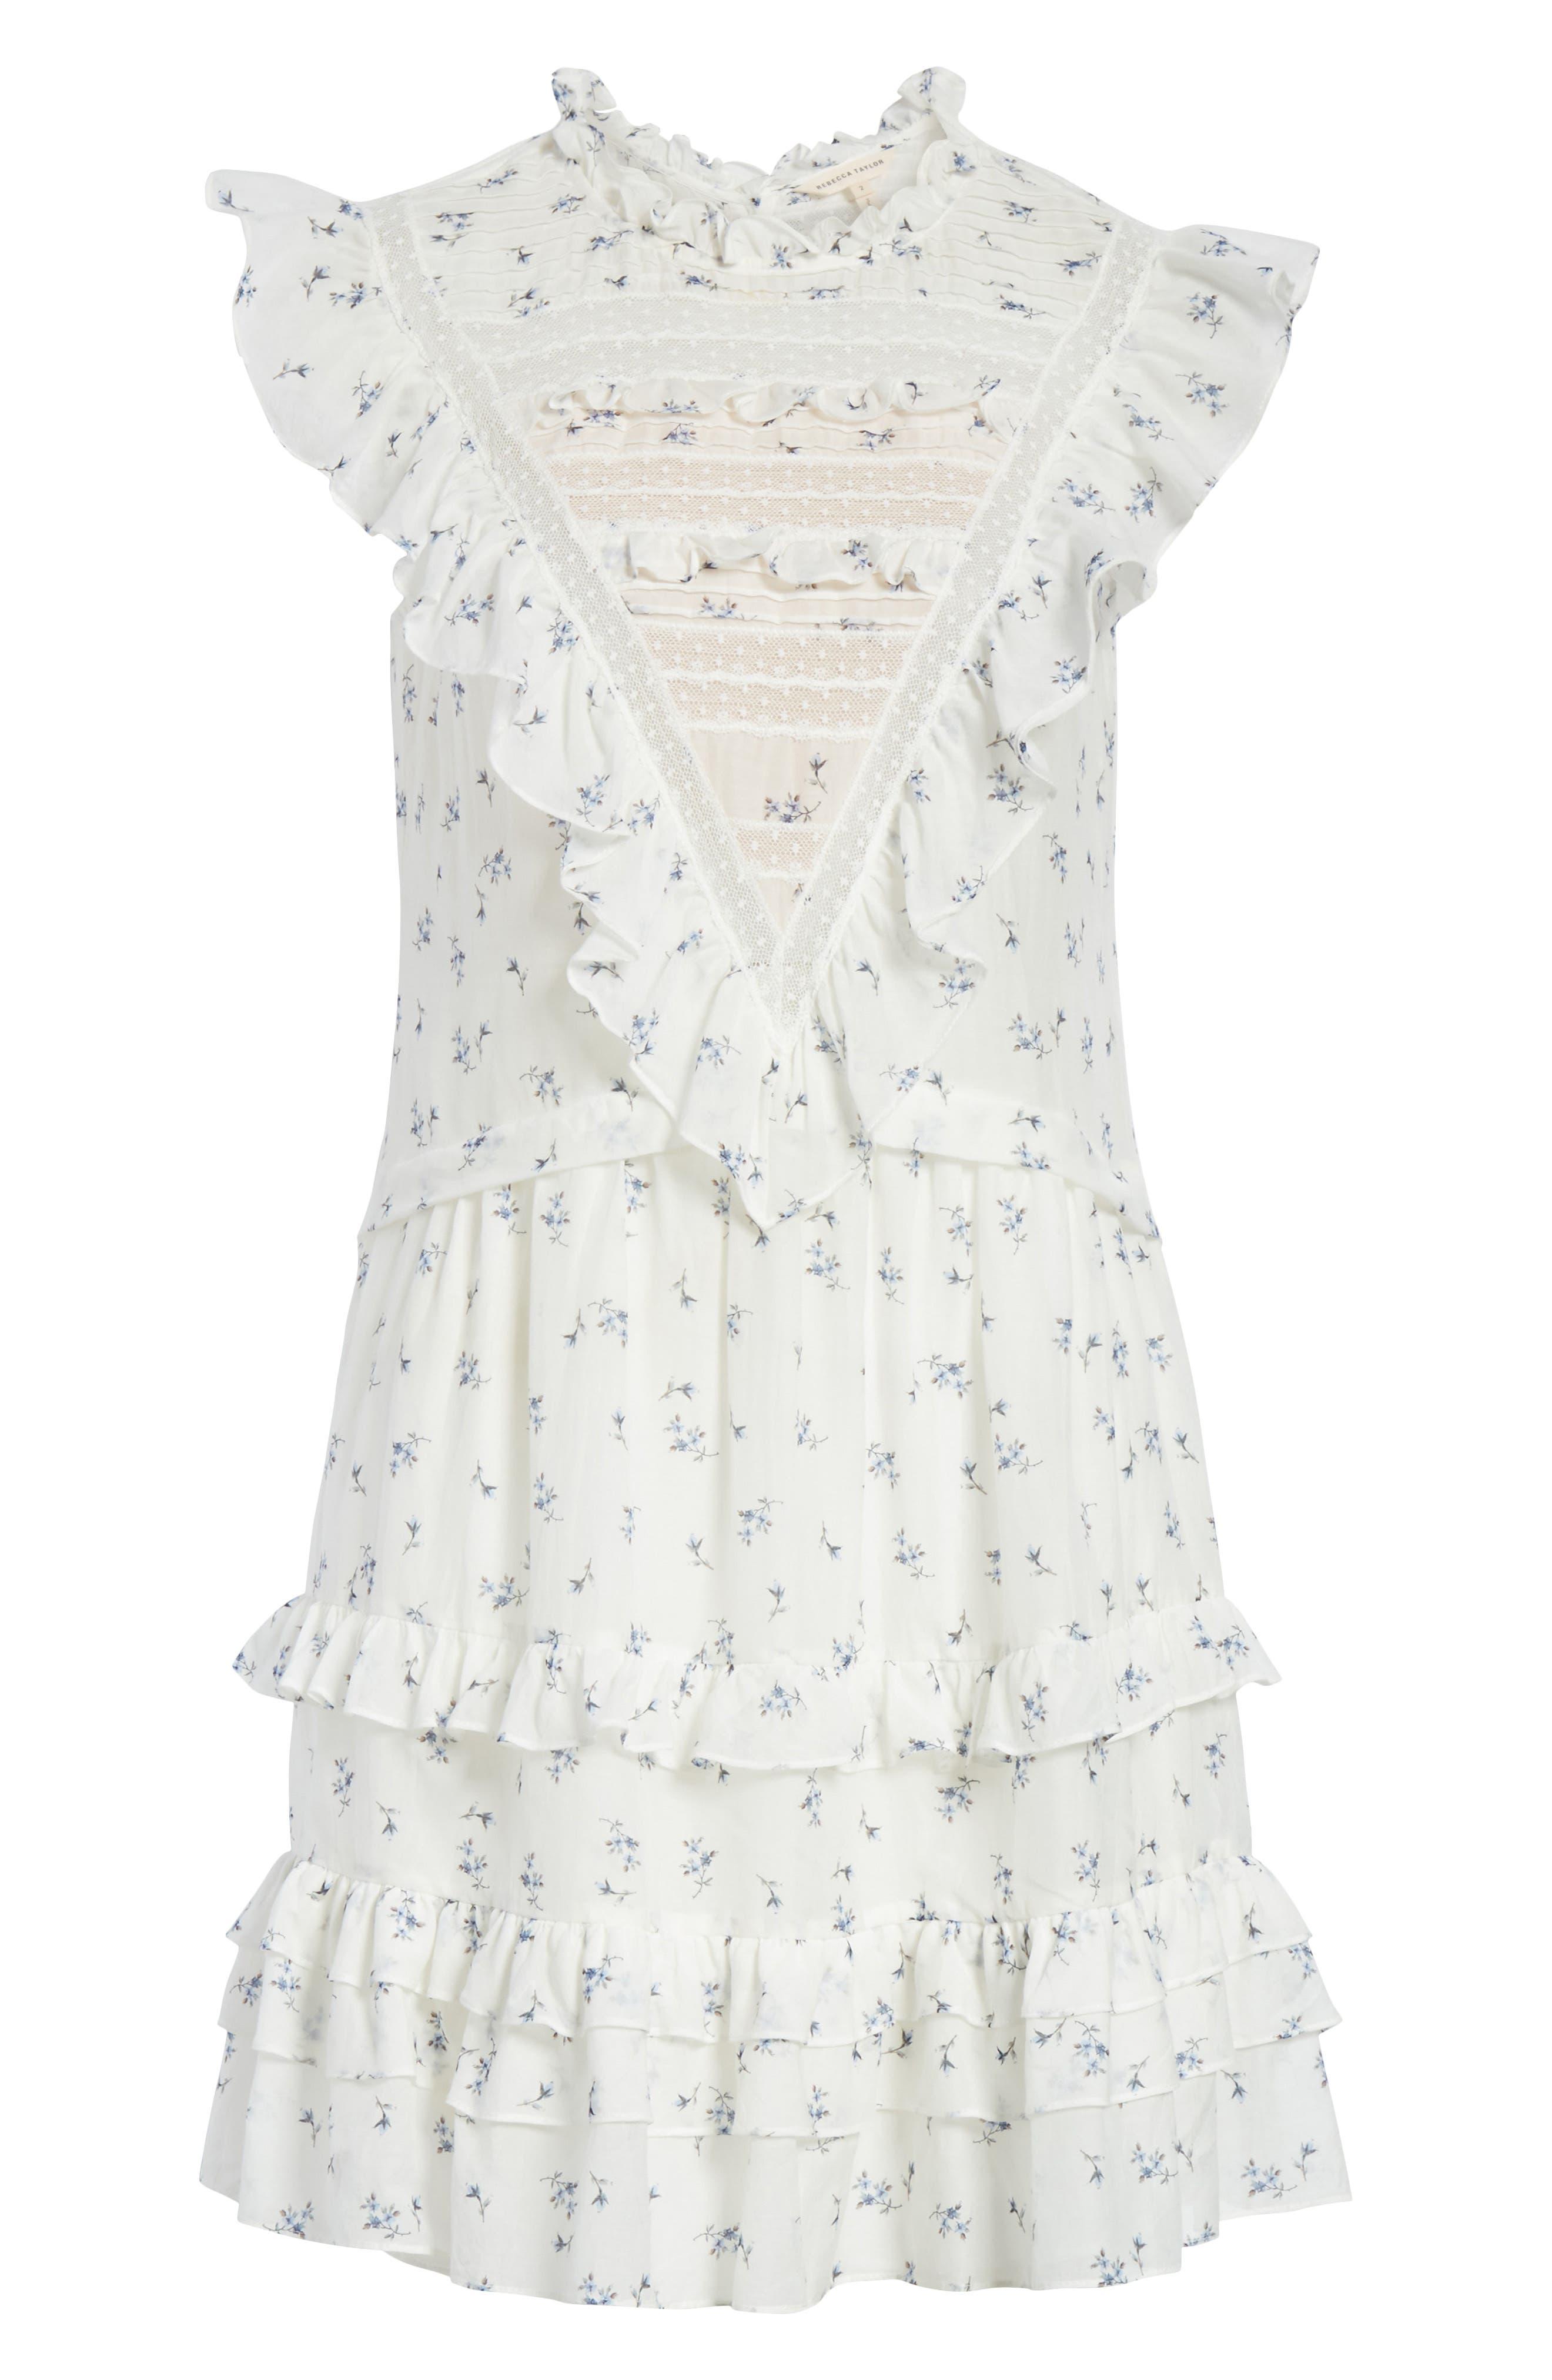 Floral Spring A-Line Dress,                             Alternate thumbnail 6, color,                             103